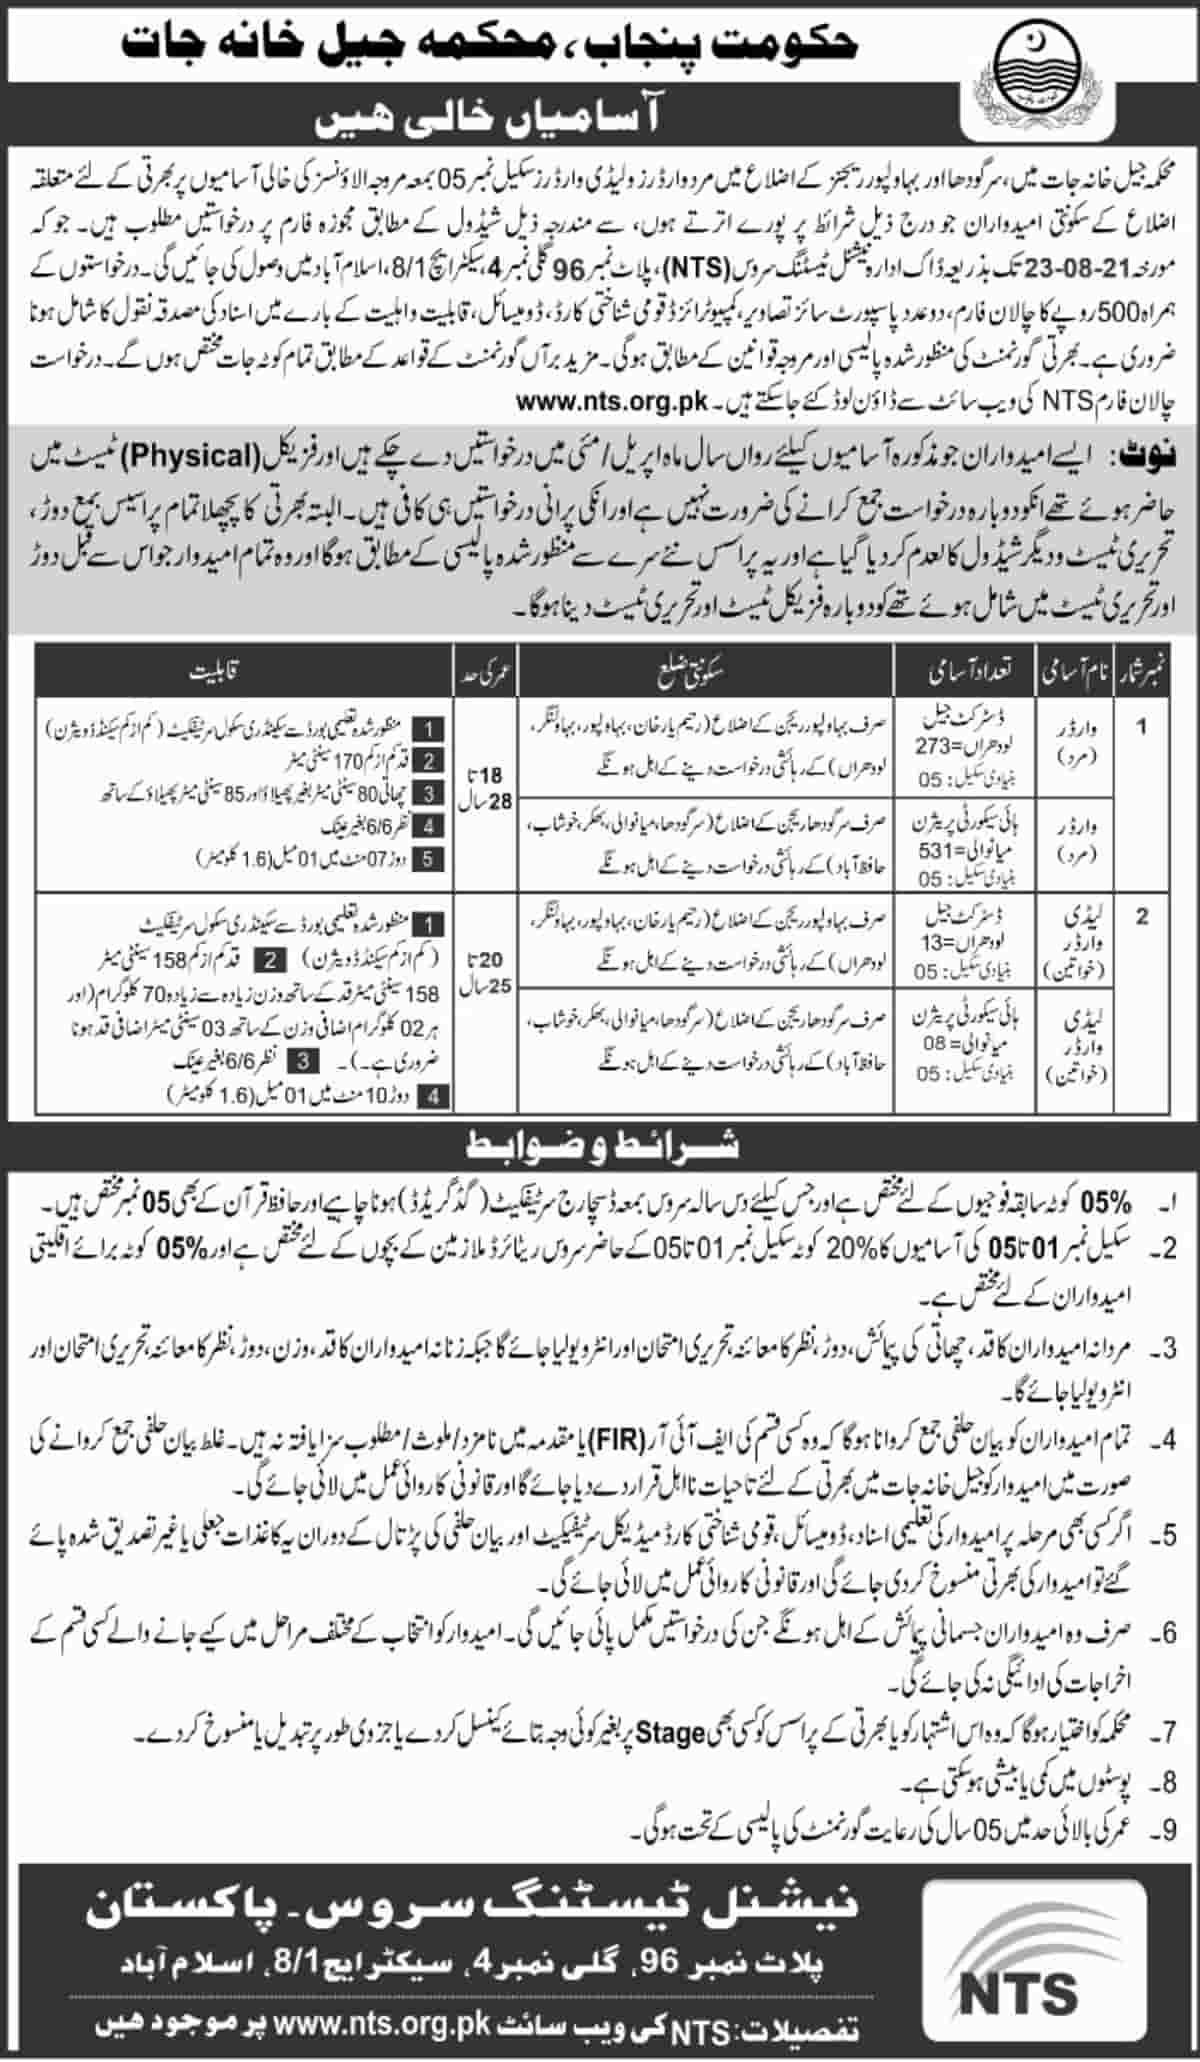 Punjab Prisons Department Jail Police Jobs August 2021 NTS Jail Warder